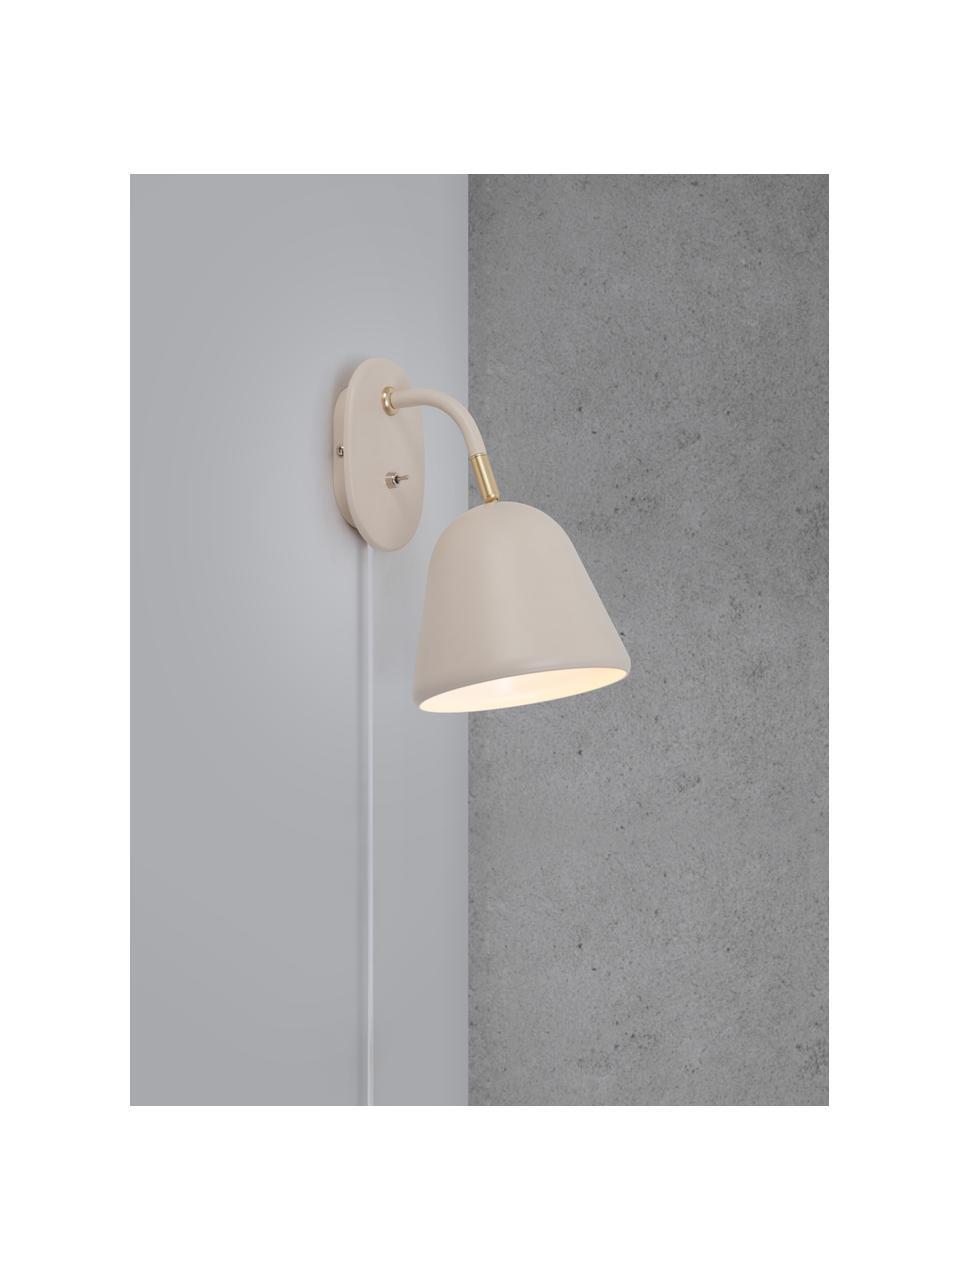 Wandlamp Fleur met stekker, Lampenkap: gecoat metaal, Lampvoet: gecoat metaal, Decoratie: metaal, Beige, 15 x 26 cm